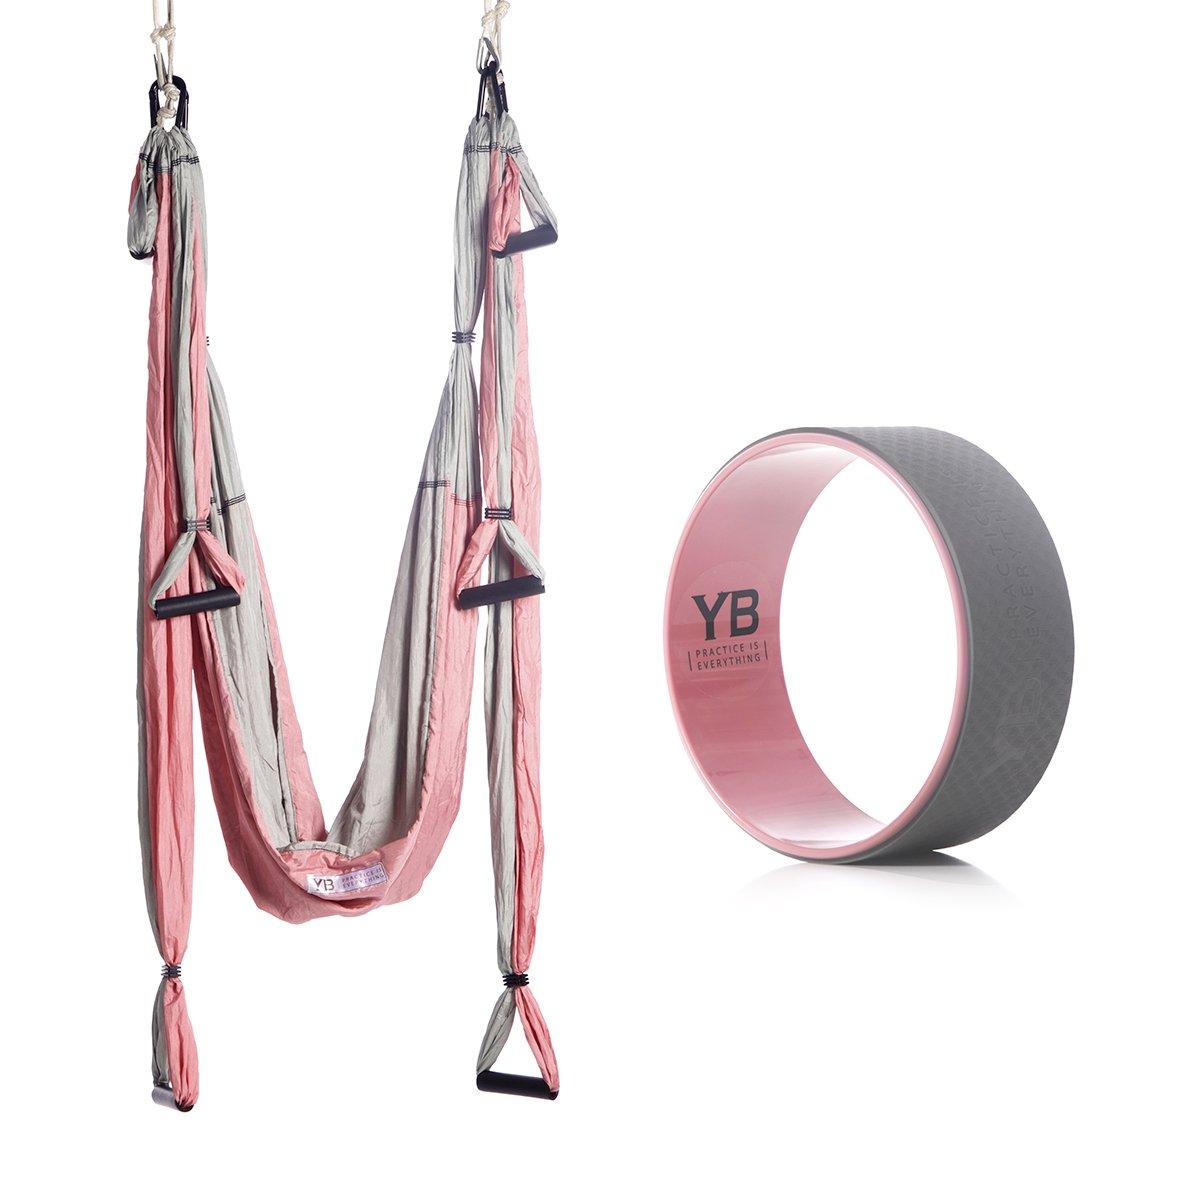 Bundle - 2 Items: Yoga Trapeze Baby Pink & Yoga Wonder Wheel Baby Pink [Bundle] - By YOGABODY - with 2 Free DVD